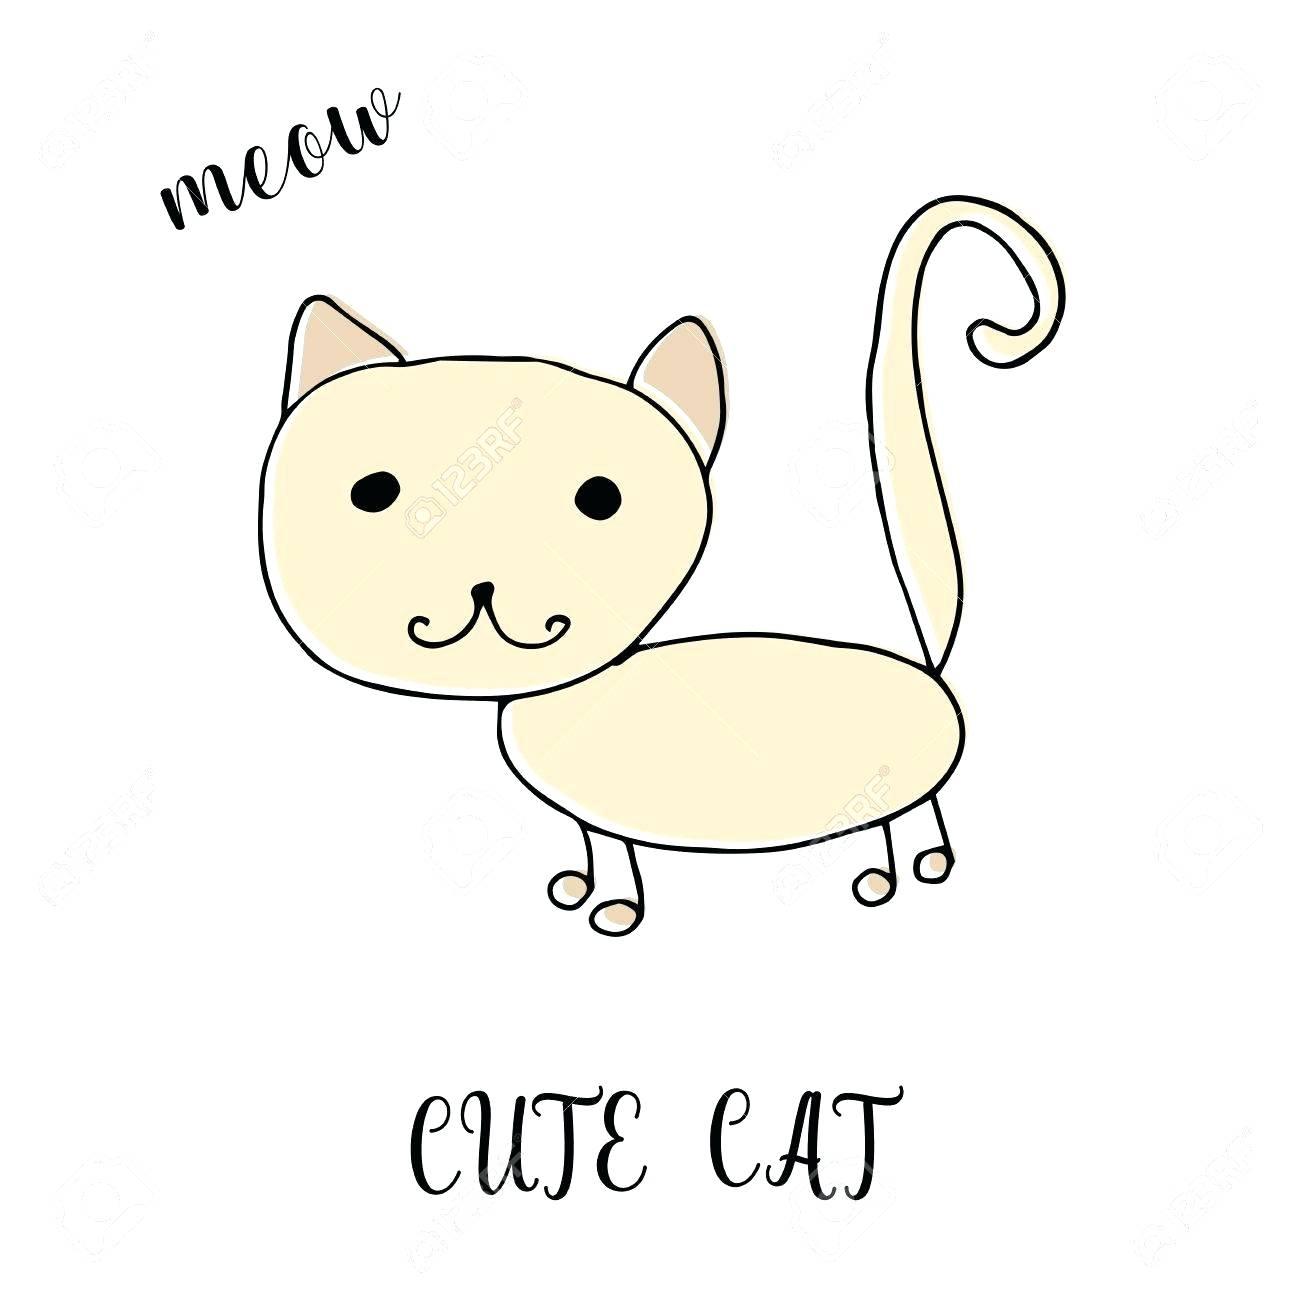 Gambar Cat Drawing Templates At Getdrawings Com Free For Personal